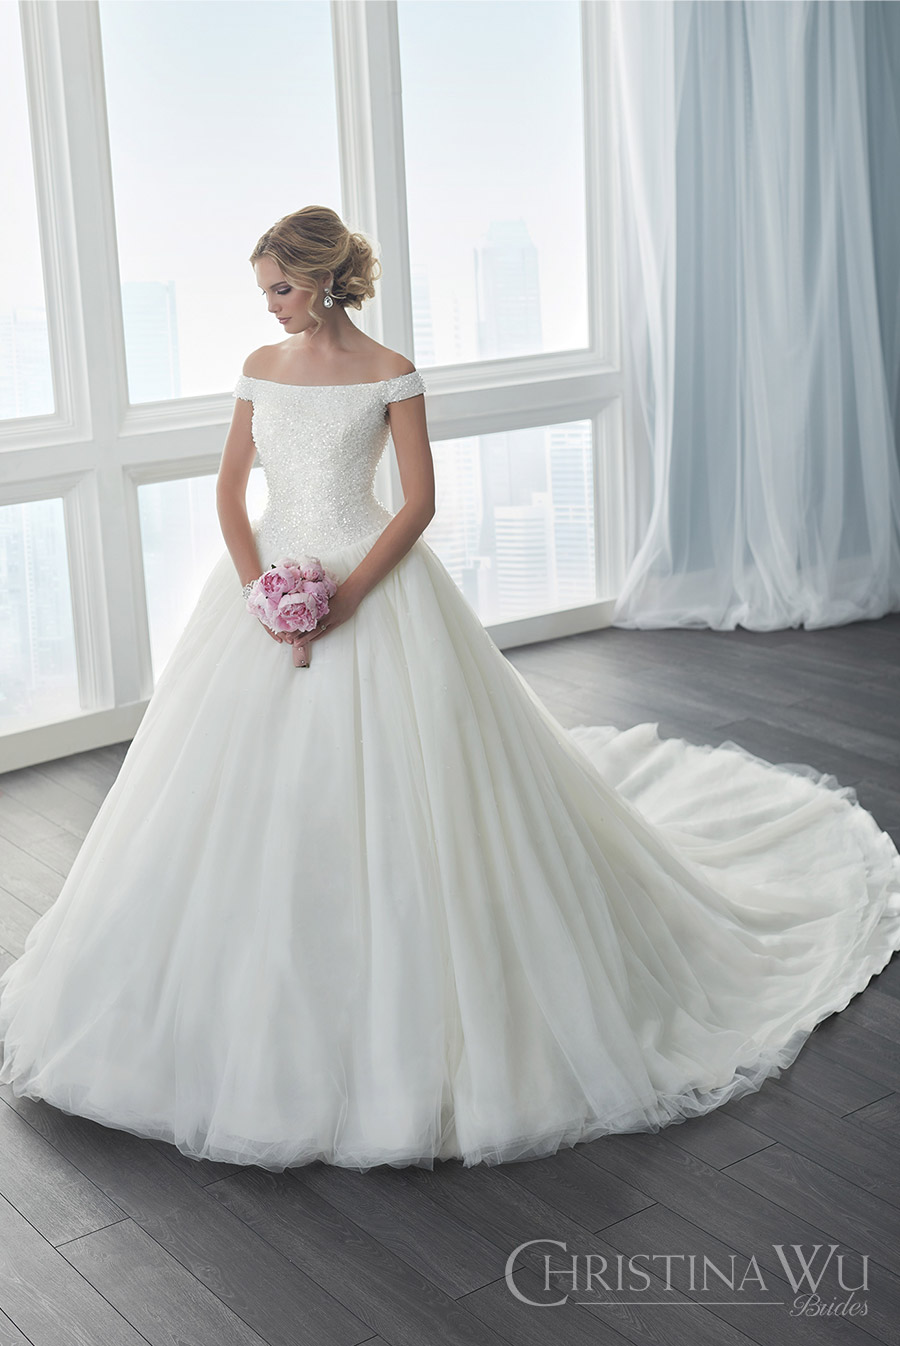 christina wu brides spring 2017 bridal off shoulder heavily beaded bodice ball gown wedding dress (15633) mv romantic princess long train